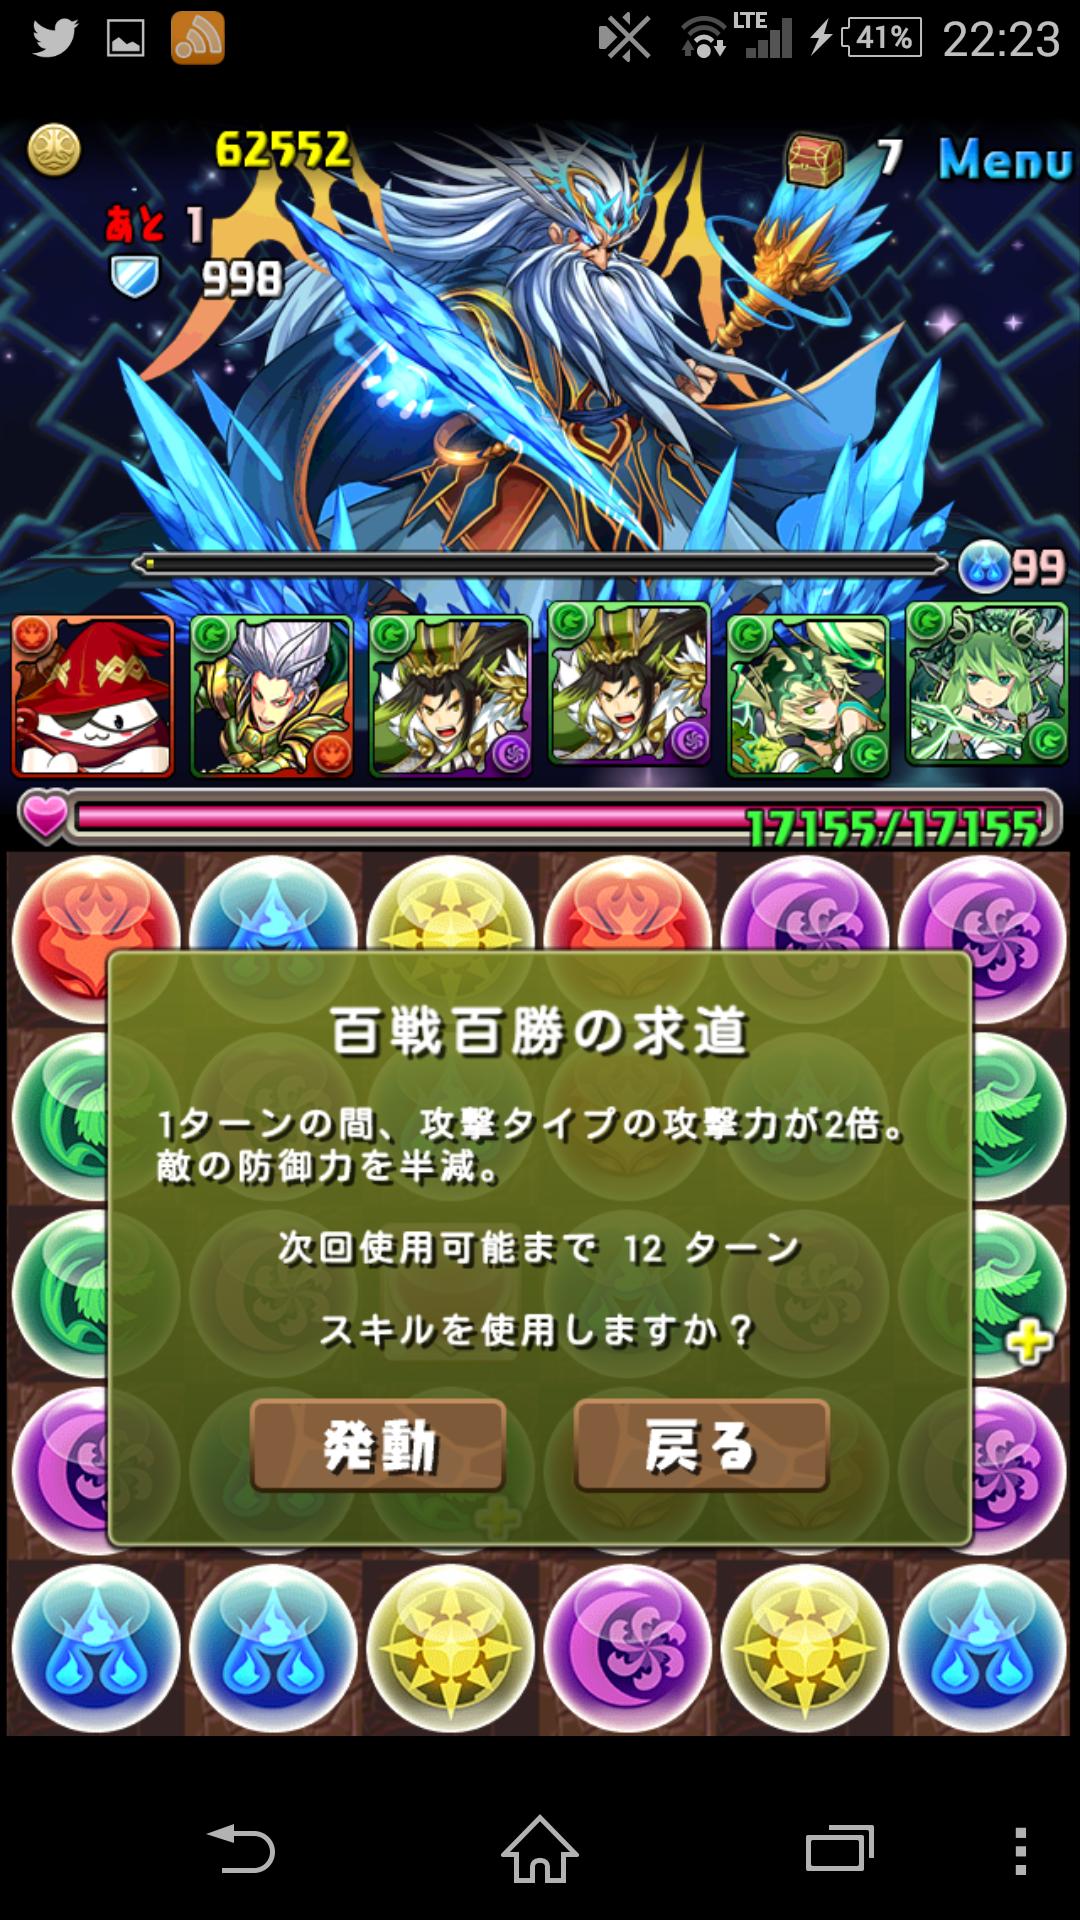 Screenshot_2015-02-20-22-23-30.png